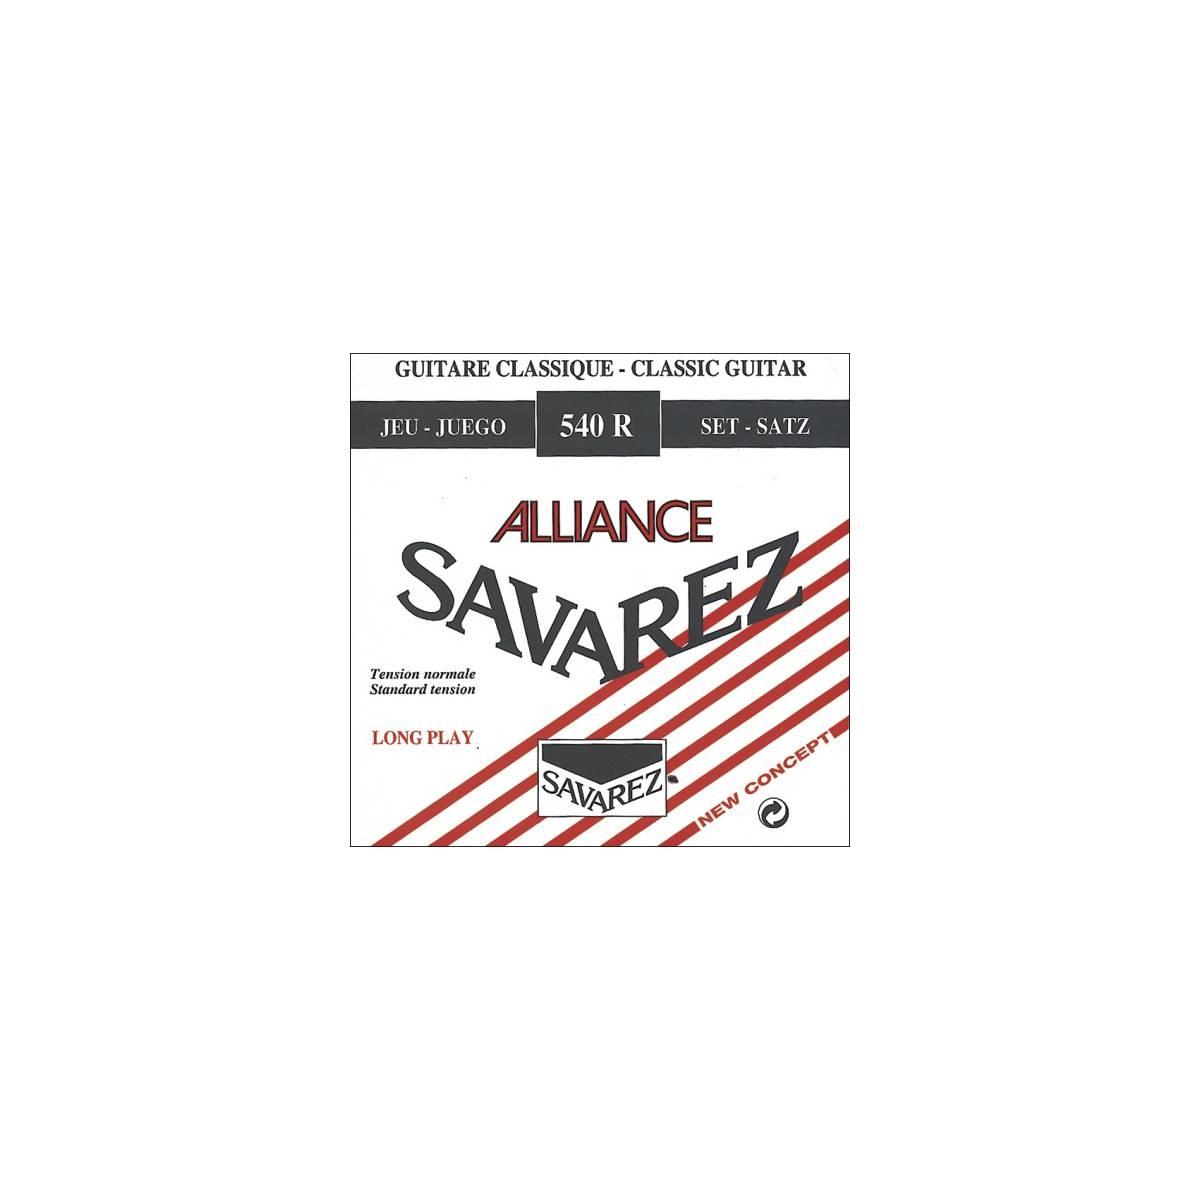 Cordes Savarez guitare classique Alliance 540R